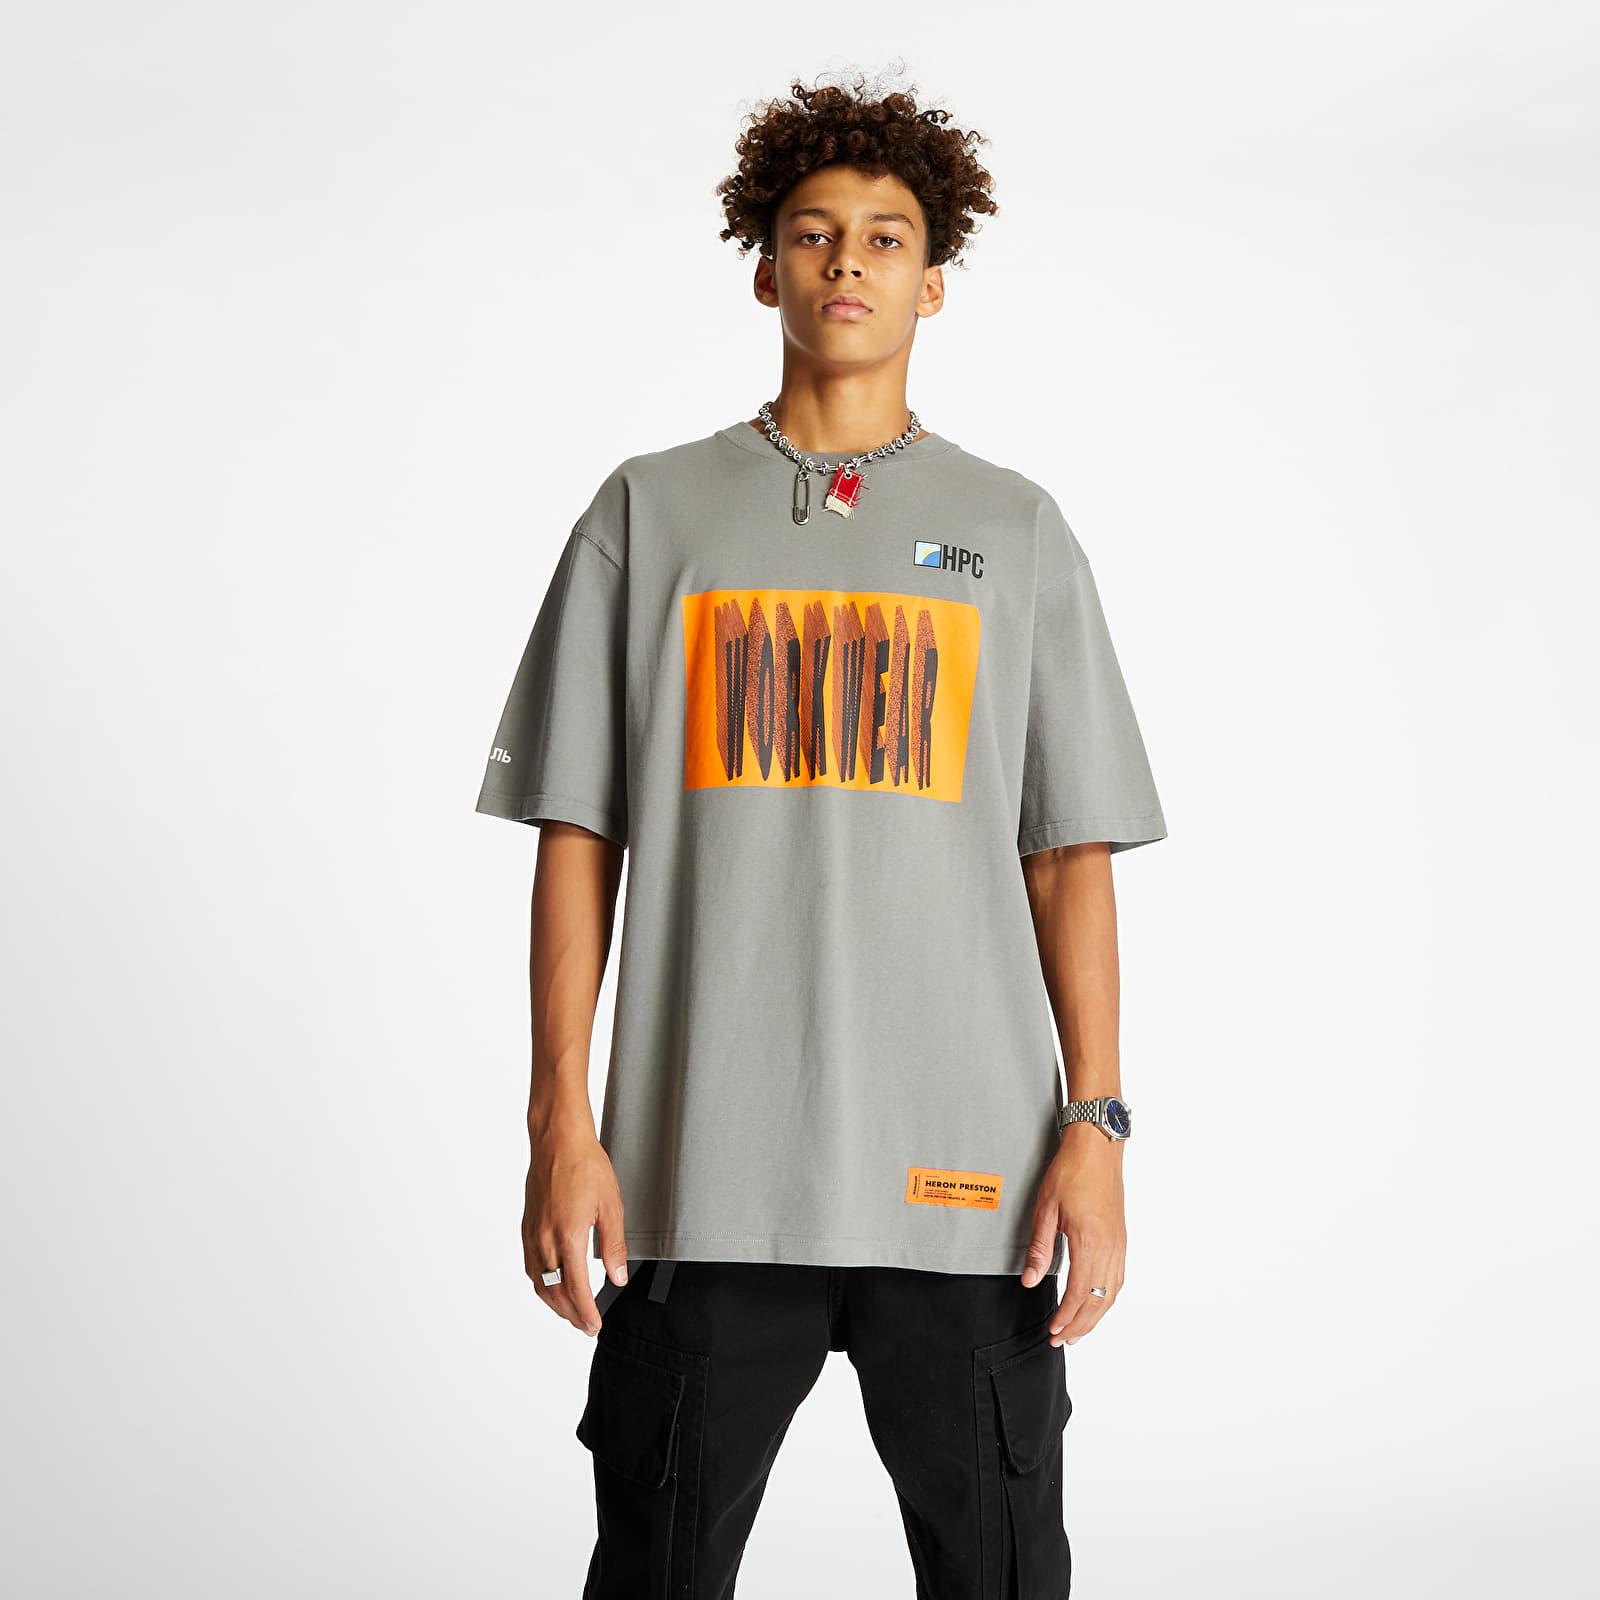 Tricouri HERON PRESTON Workwear Tee Grey/ Orange